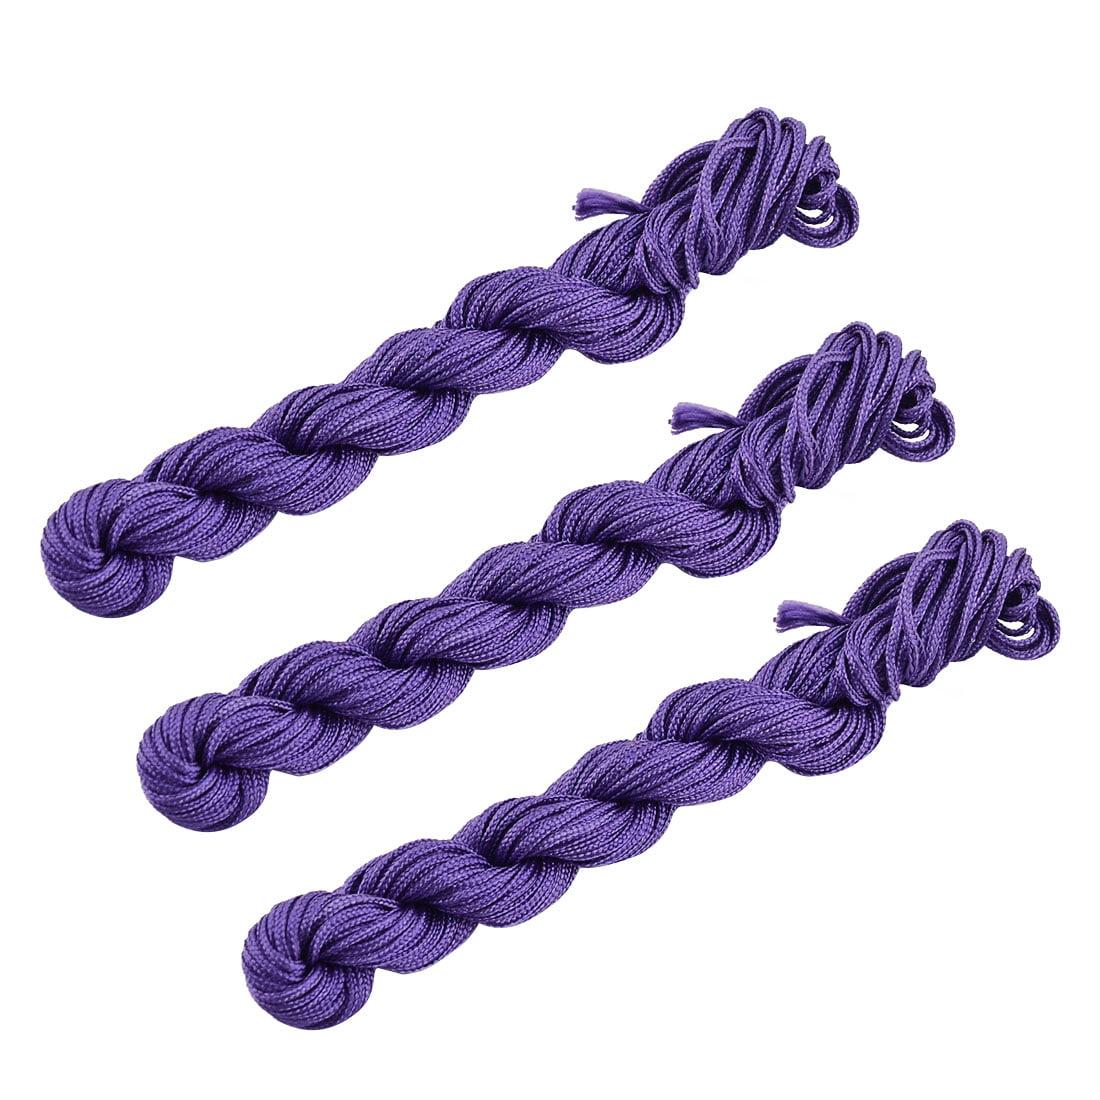 Polyester Chinese Knot Bracelet Beading Rattail Cord Dark Purple 16 Yards 3pcs - image 2 de 2